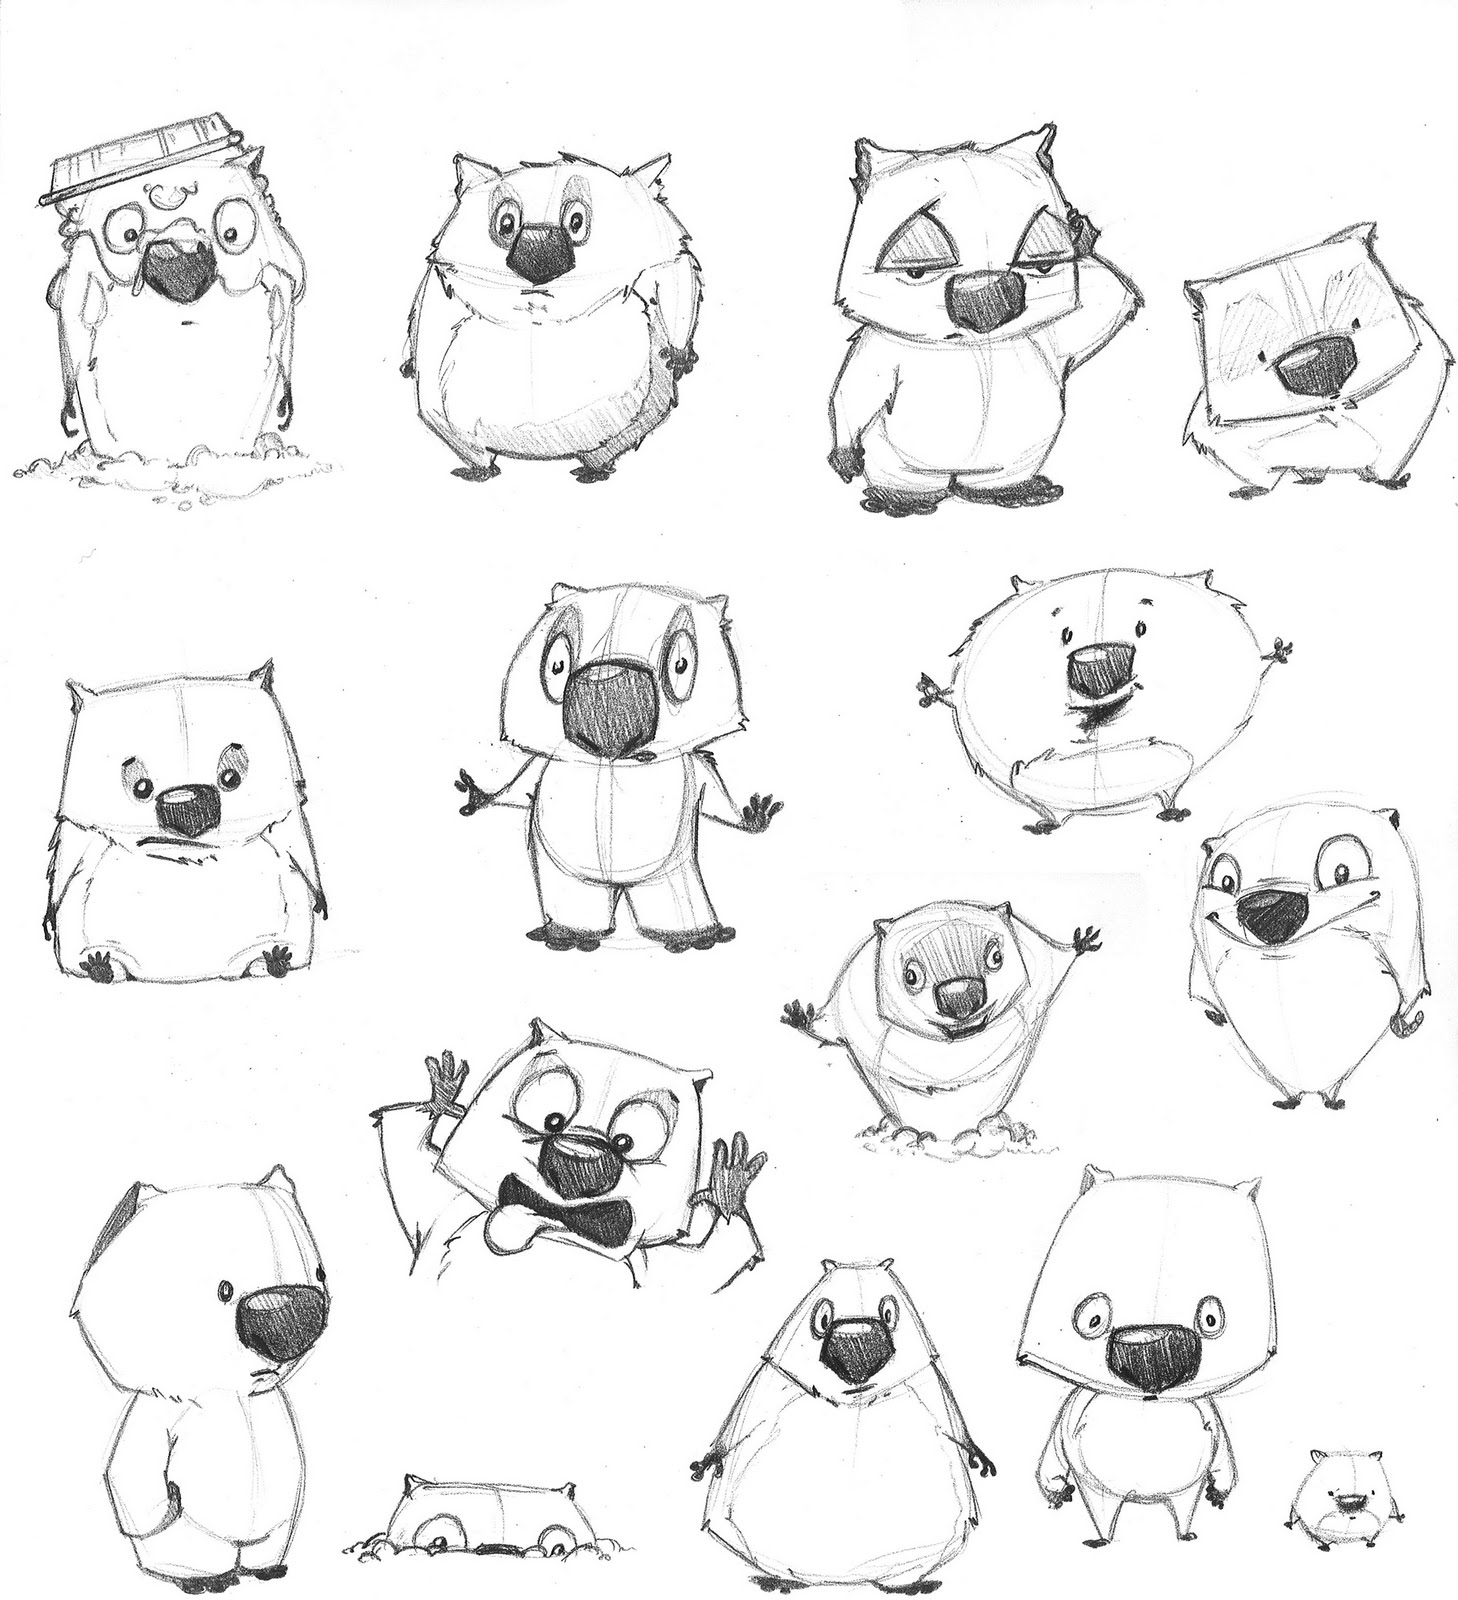 Coloring Pages Wombat Coloring Page wombat coloring page futpal com futpal